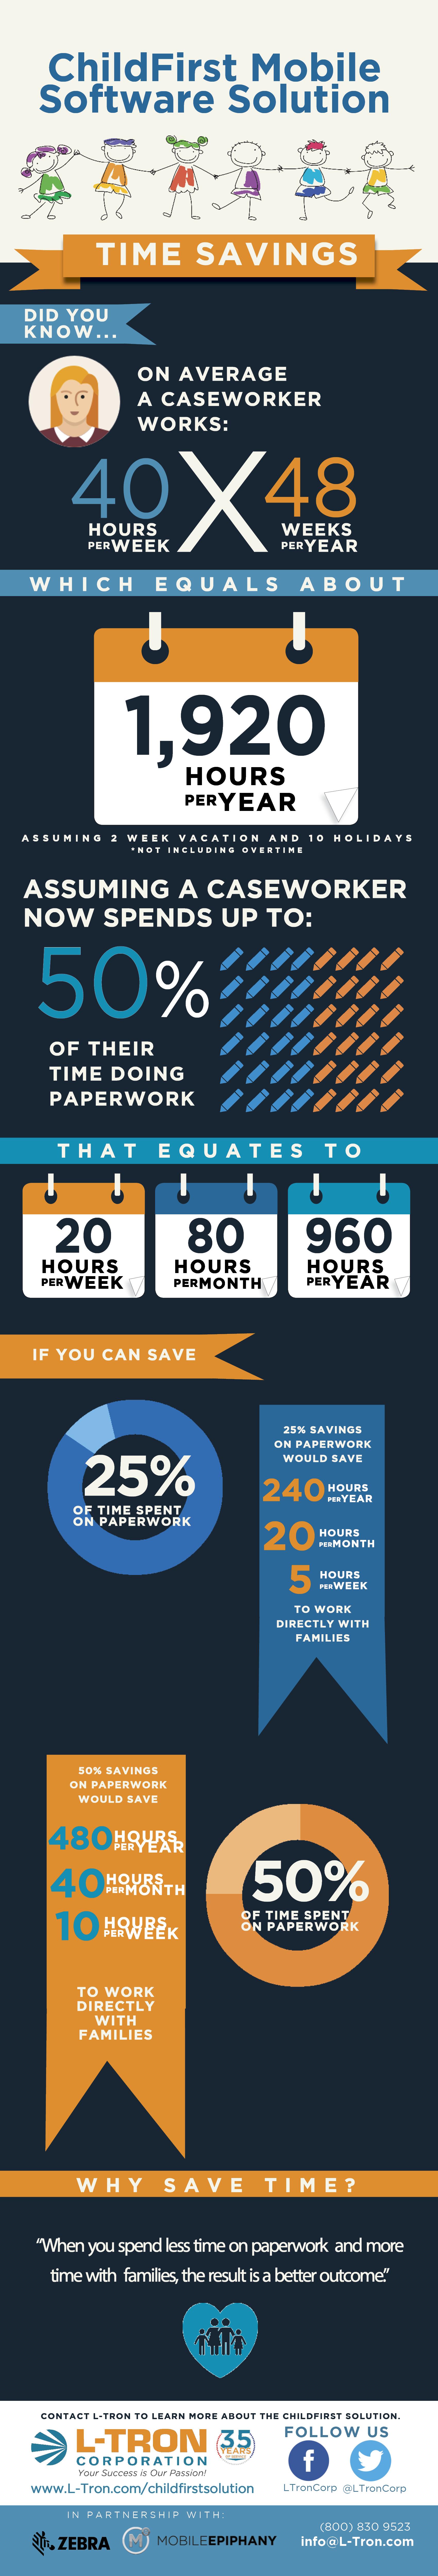 ChildFirst time savings